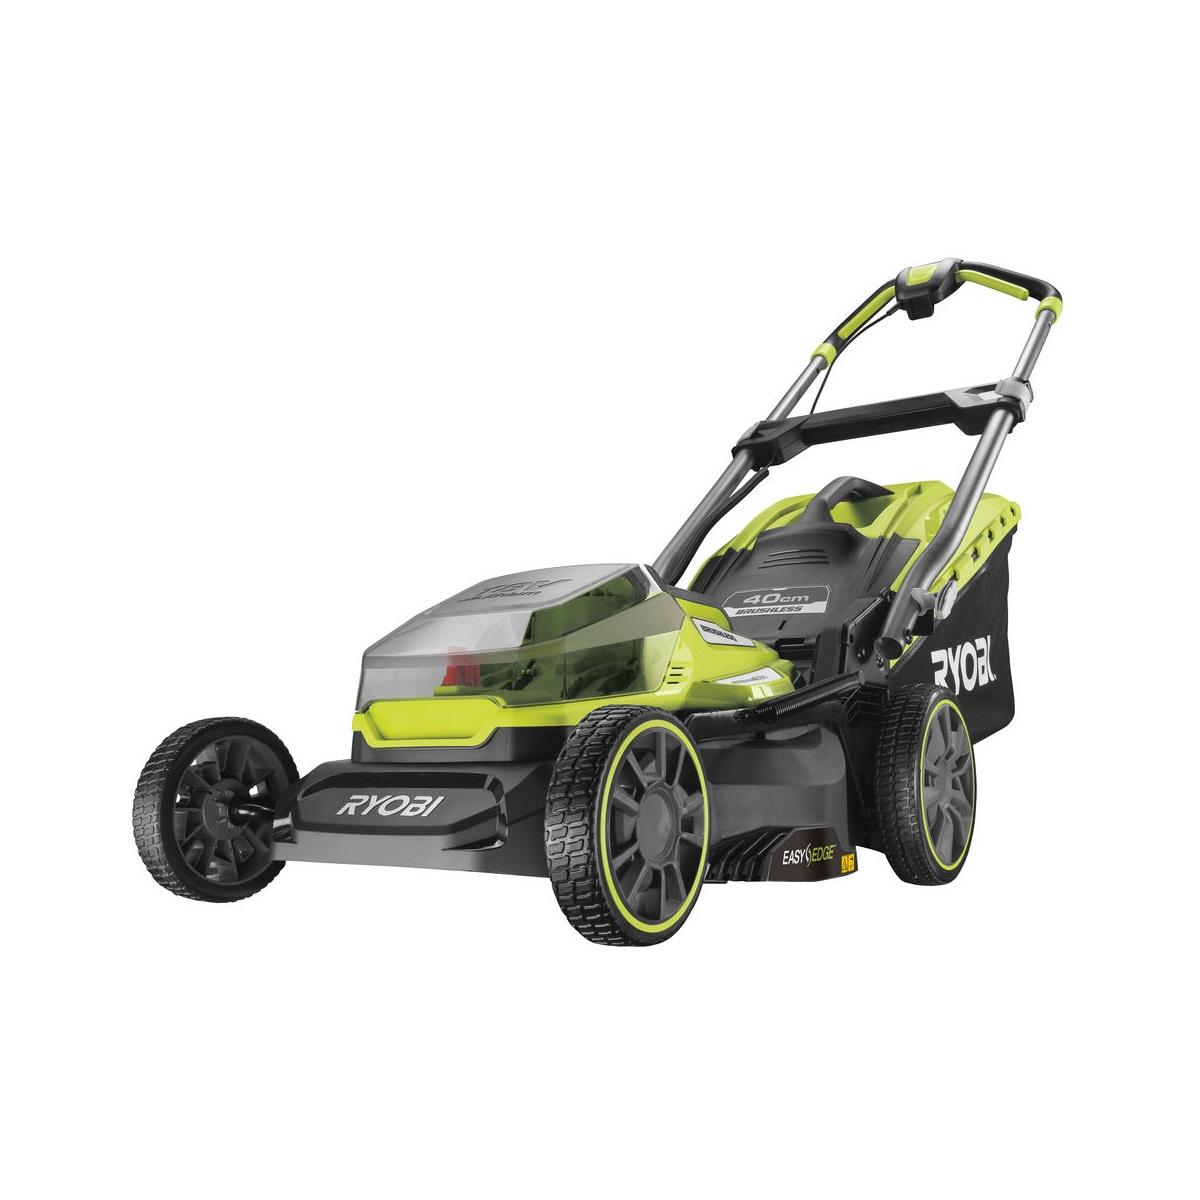 Ryobi RY18LMX40A-240aku 18 V travní sekačka + 2x 4,0Ah baterie + nabíječka ONE+